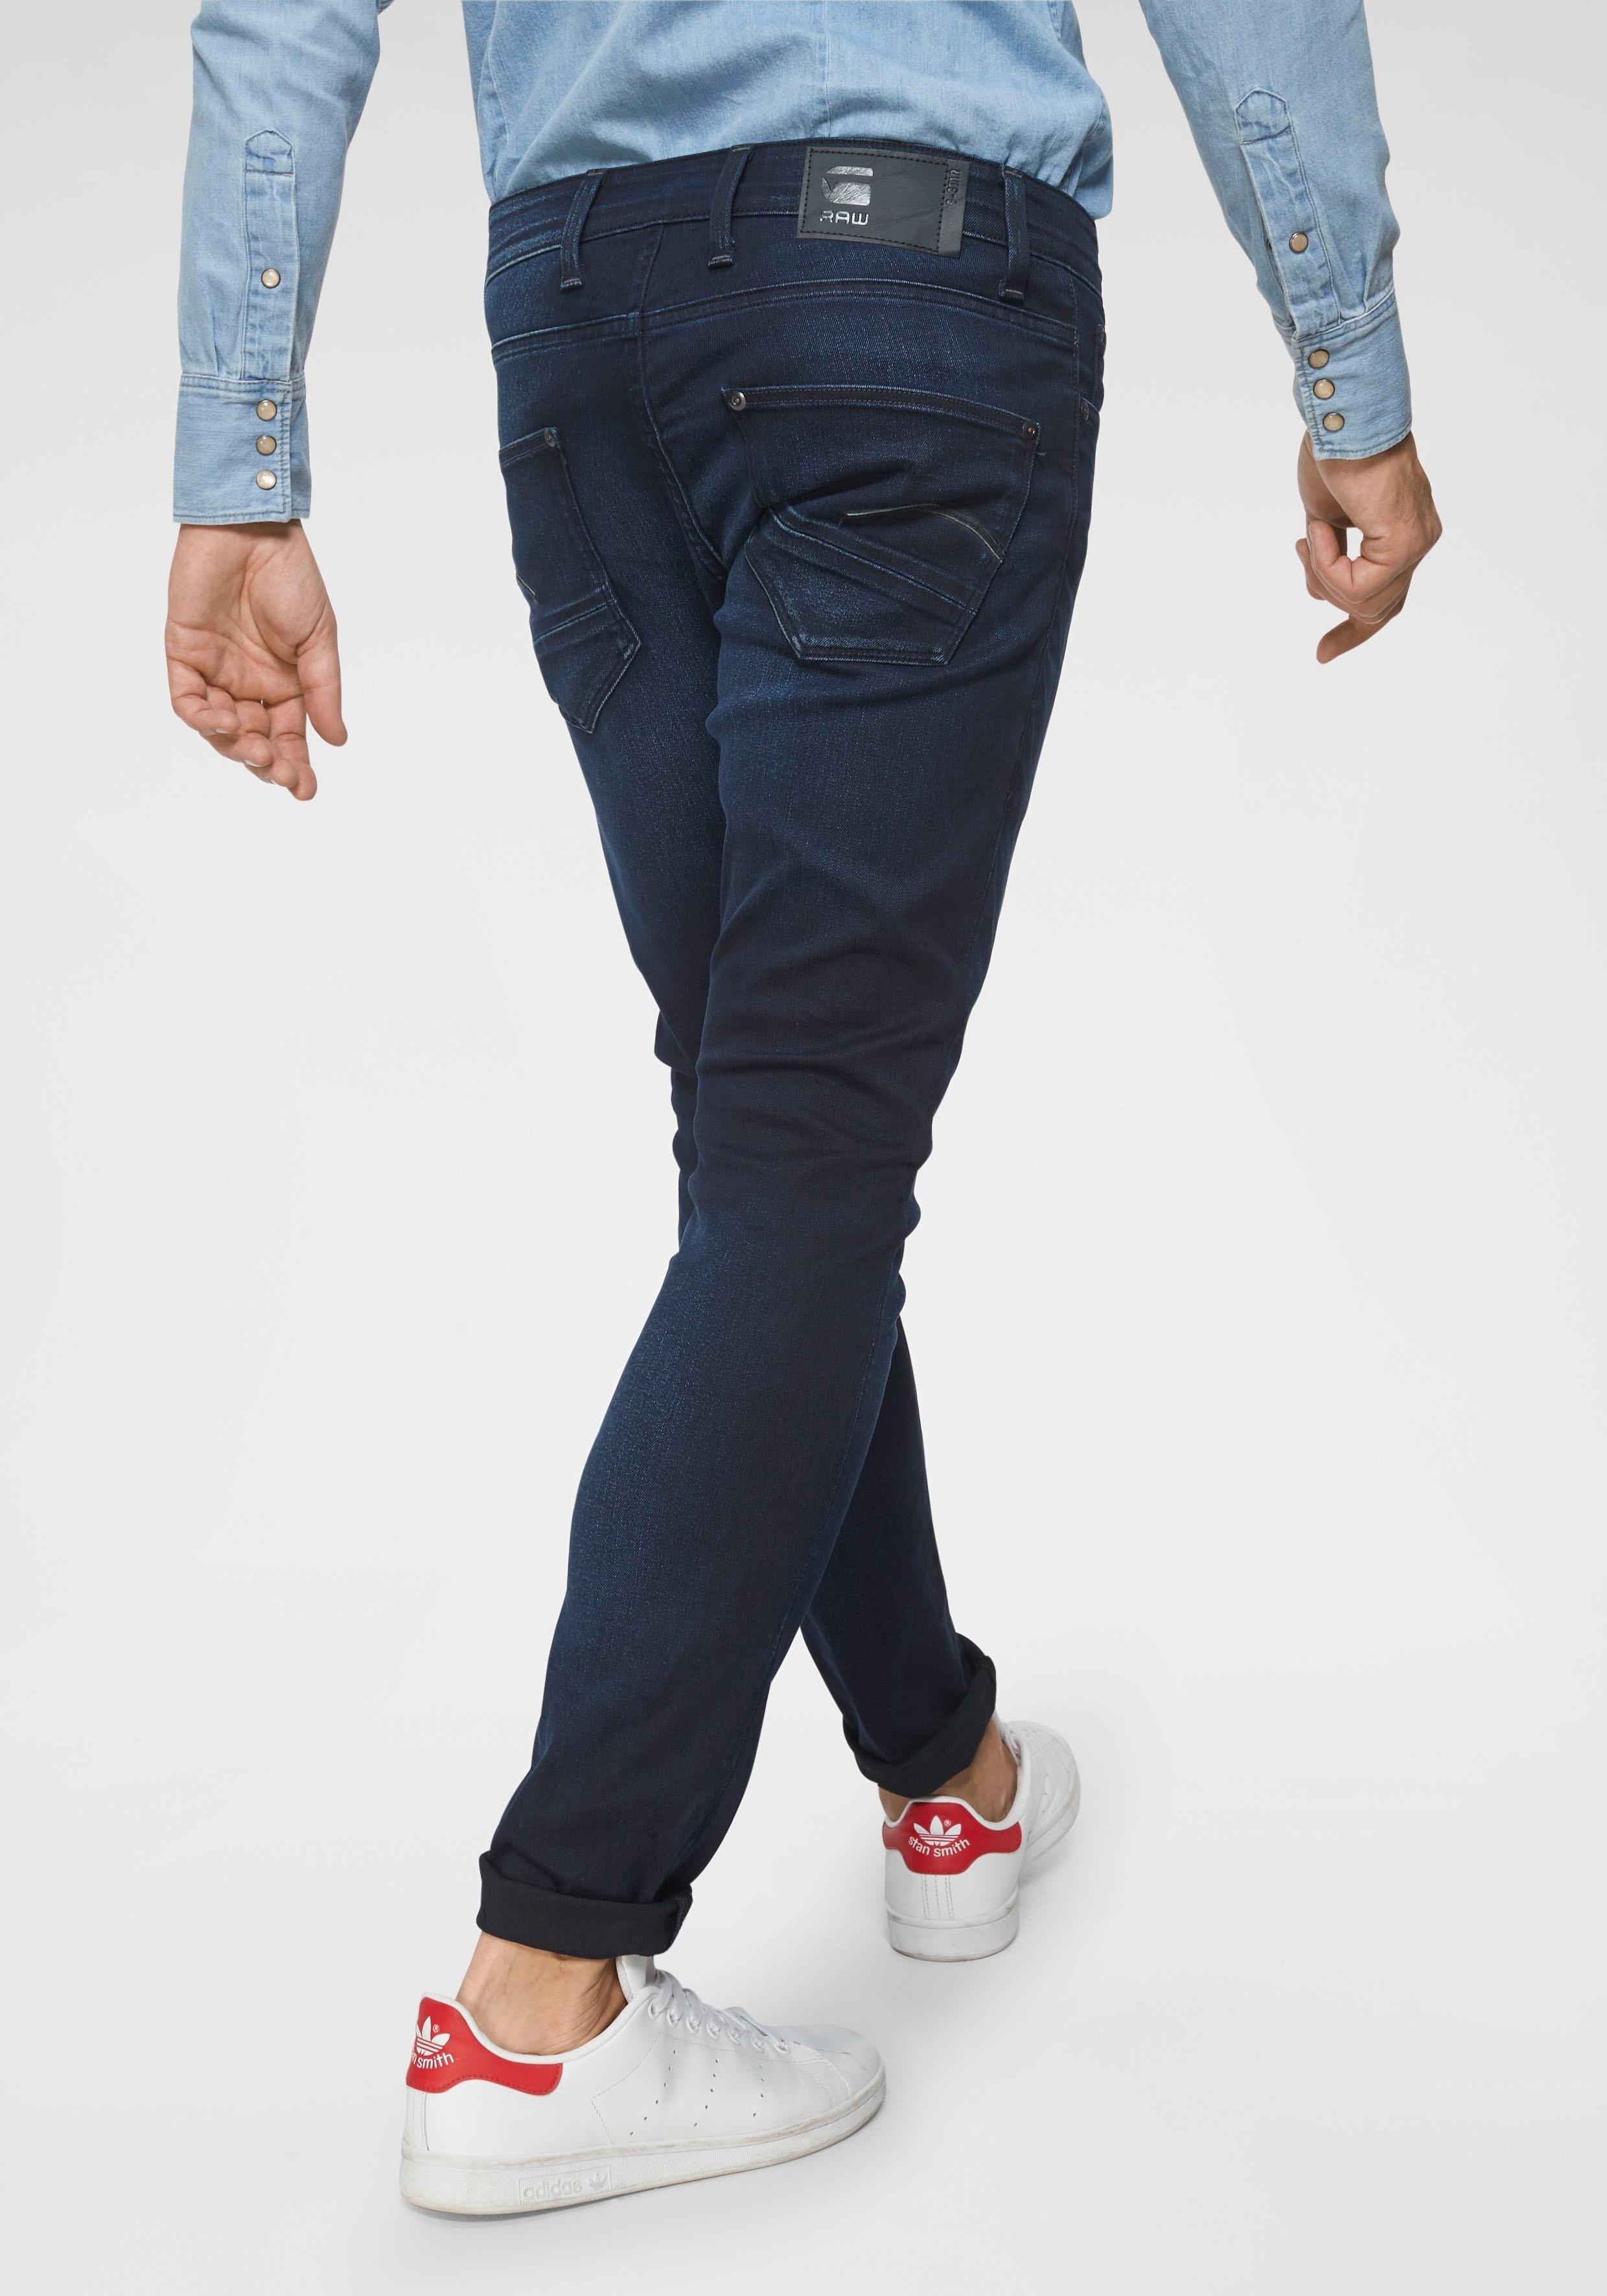 G-Star RAW Slim fit jeans Revend skinny nu online kopen bij OTTO